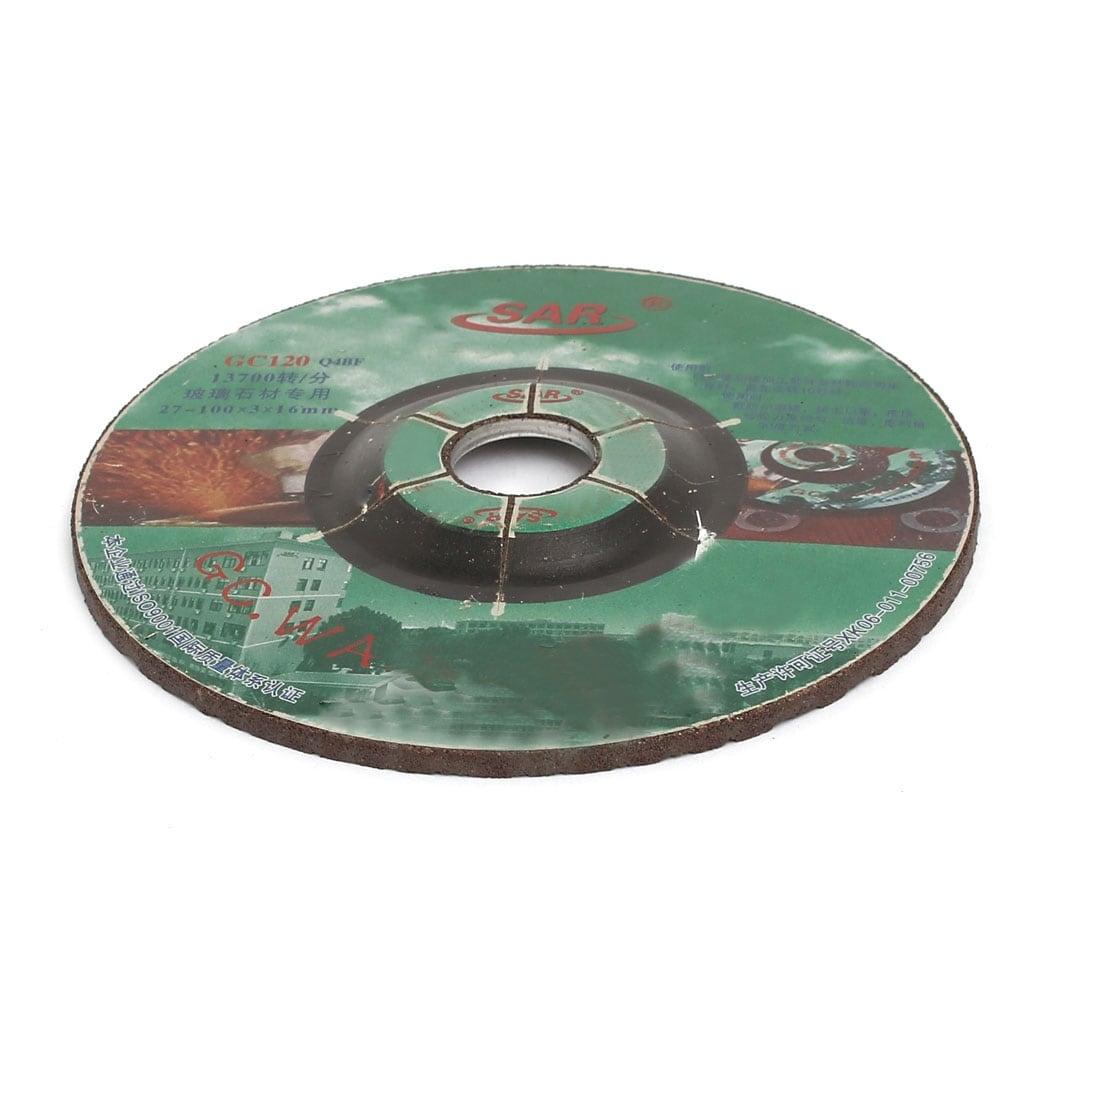 GC120 100mmx3mm Cutting Wheel Grinding Cut Off Disc Brown